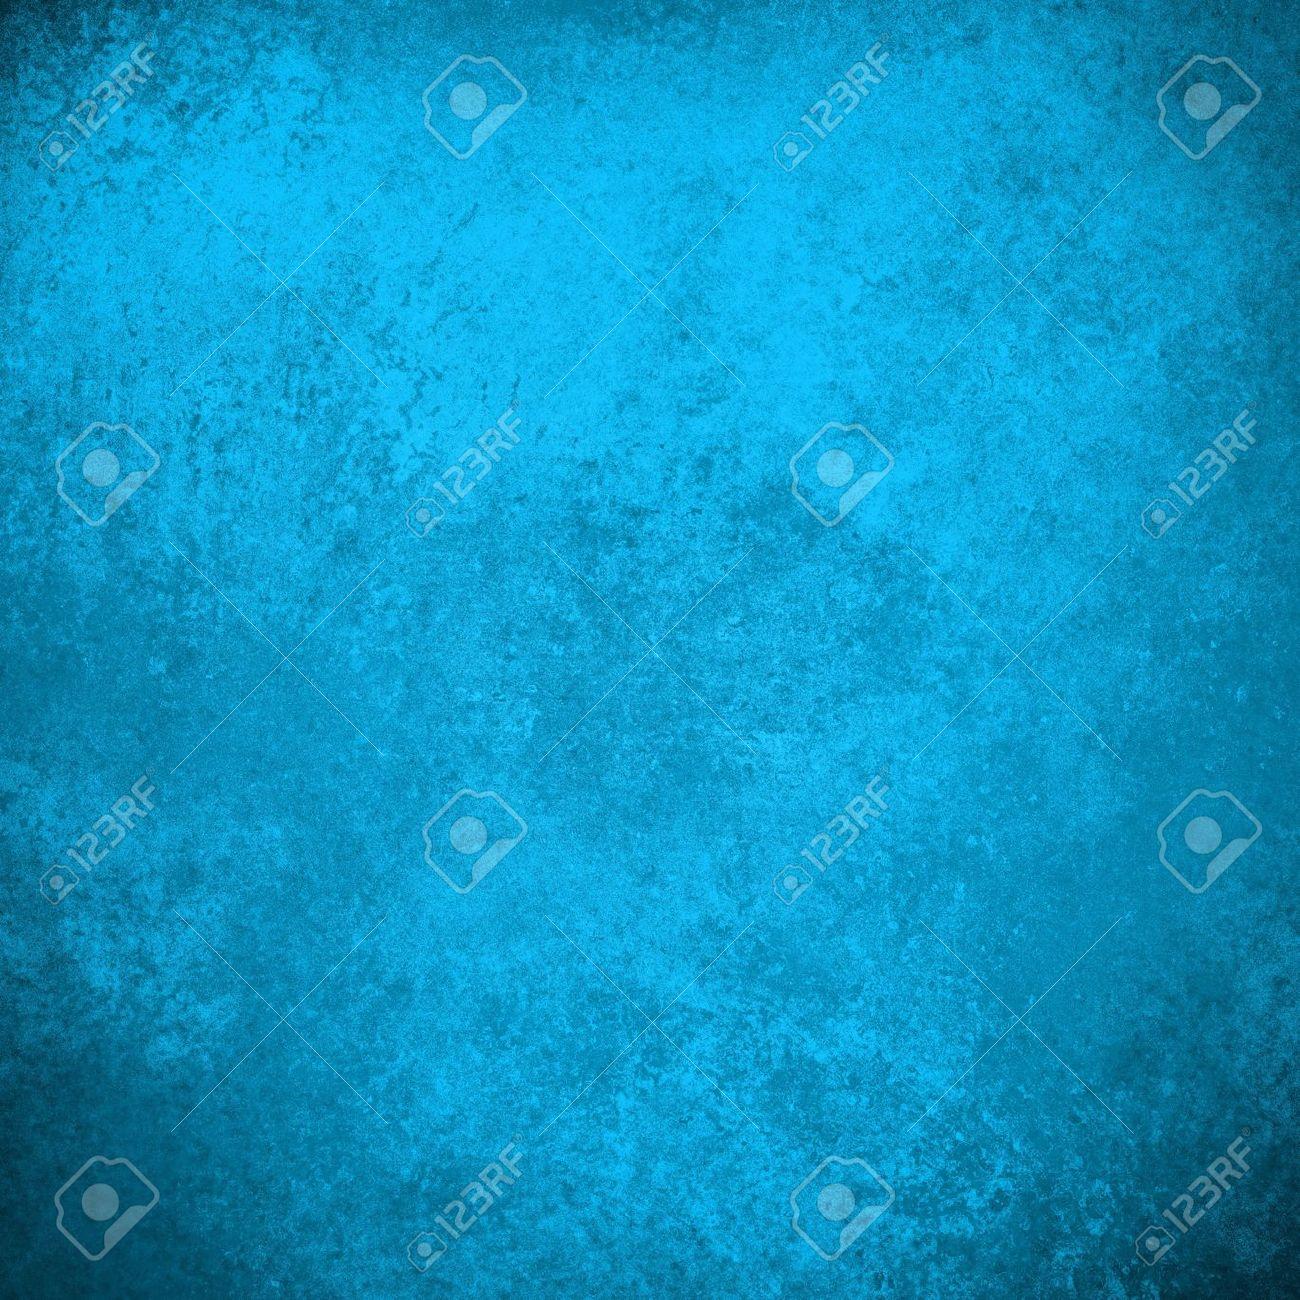 Abstract Blue Background Antique Old Vintage Grunge Background